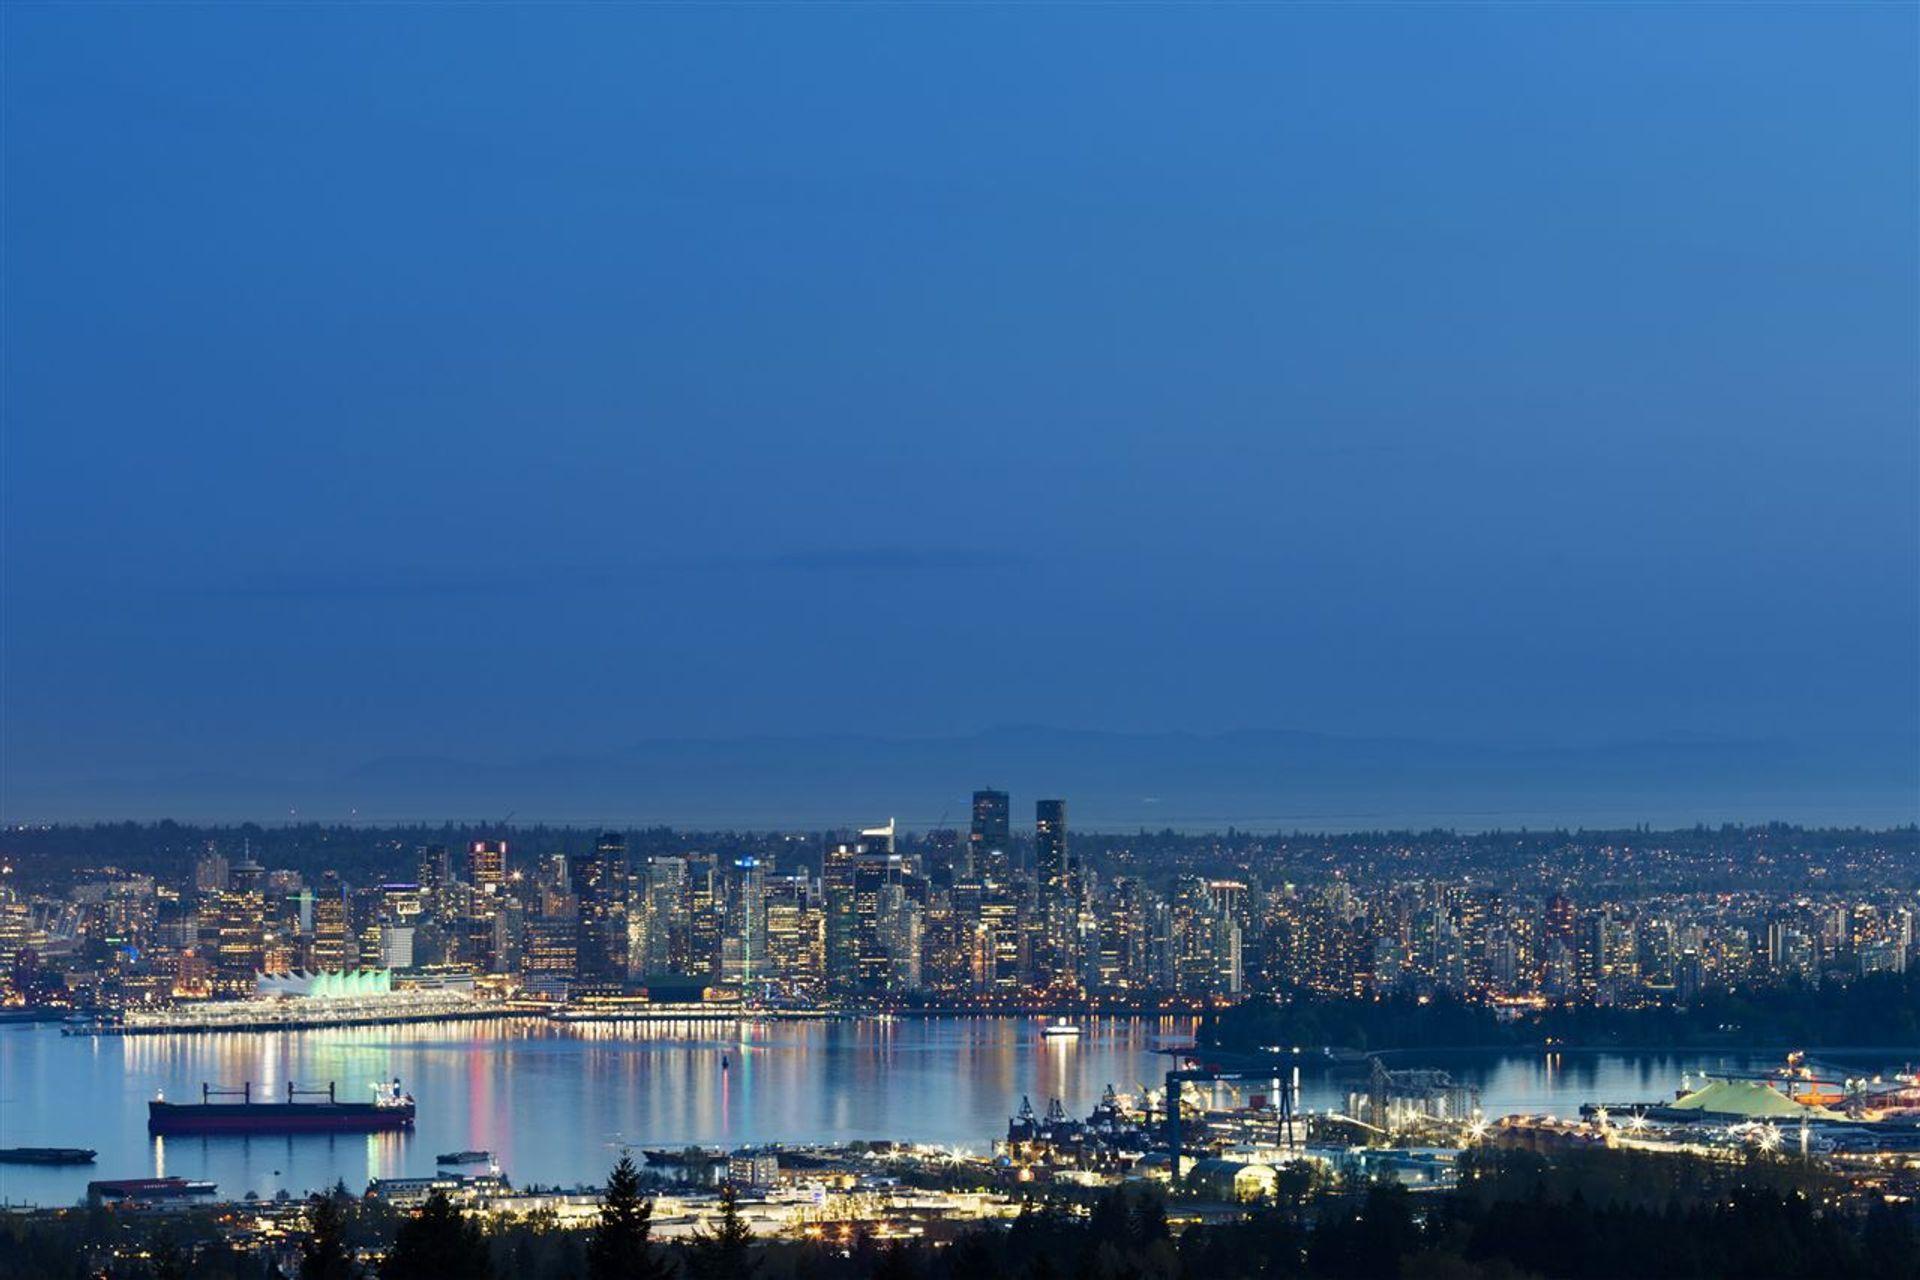 212-newdale-court-upper-delbrook-north-vancouver-01 at 212 Newdale Court, Upper Delbrook, North Vancouver